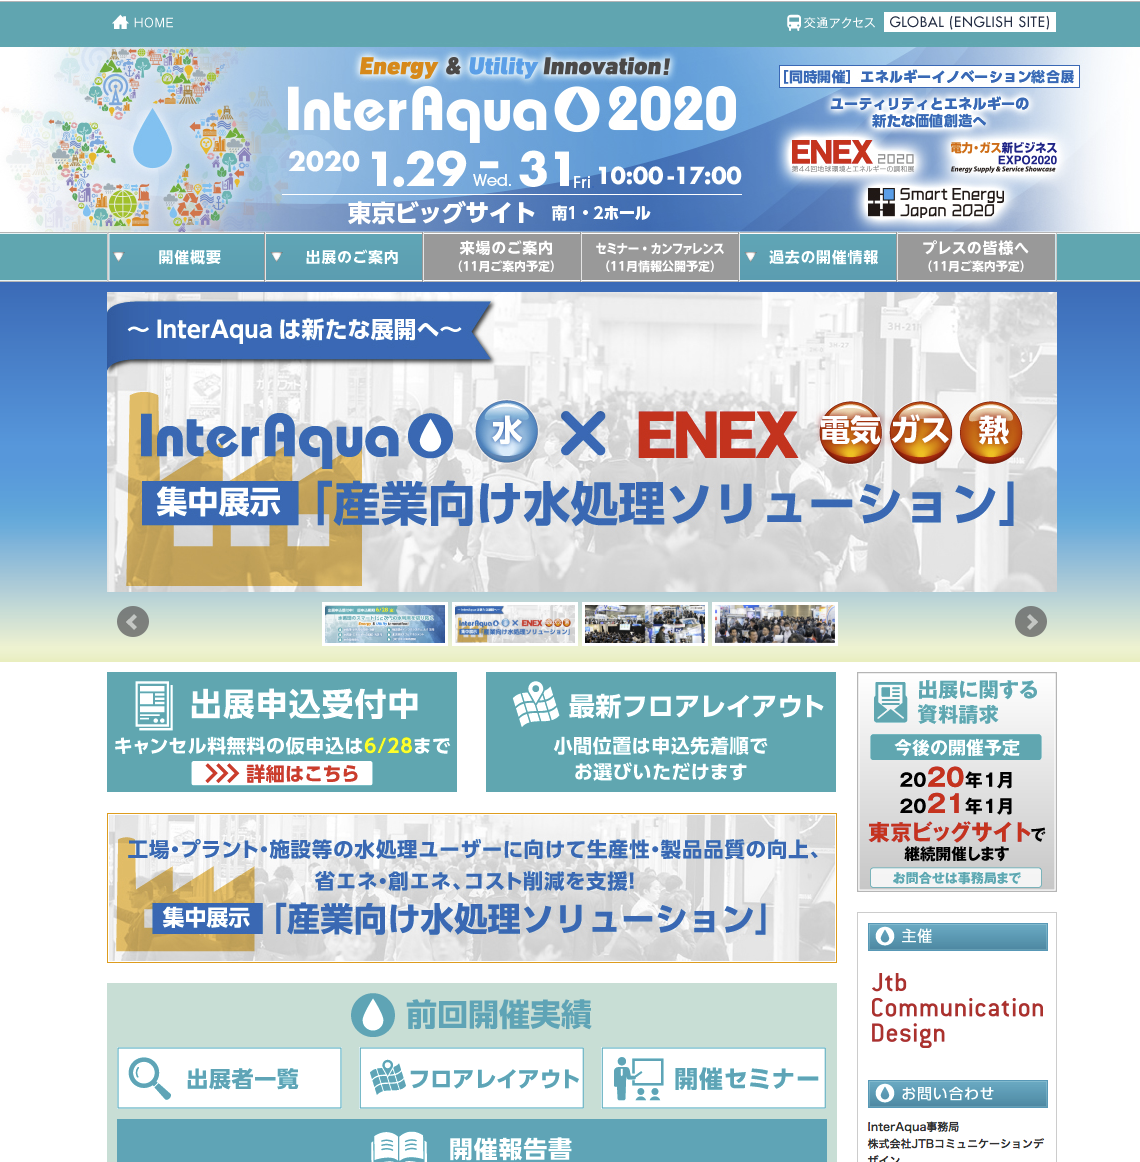 InterAqua 2020